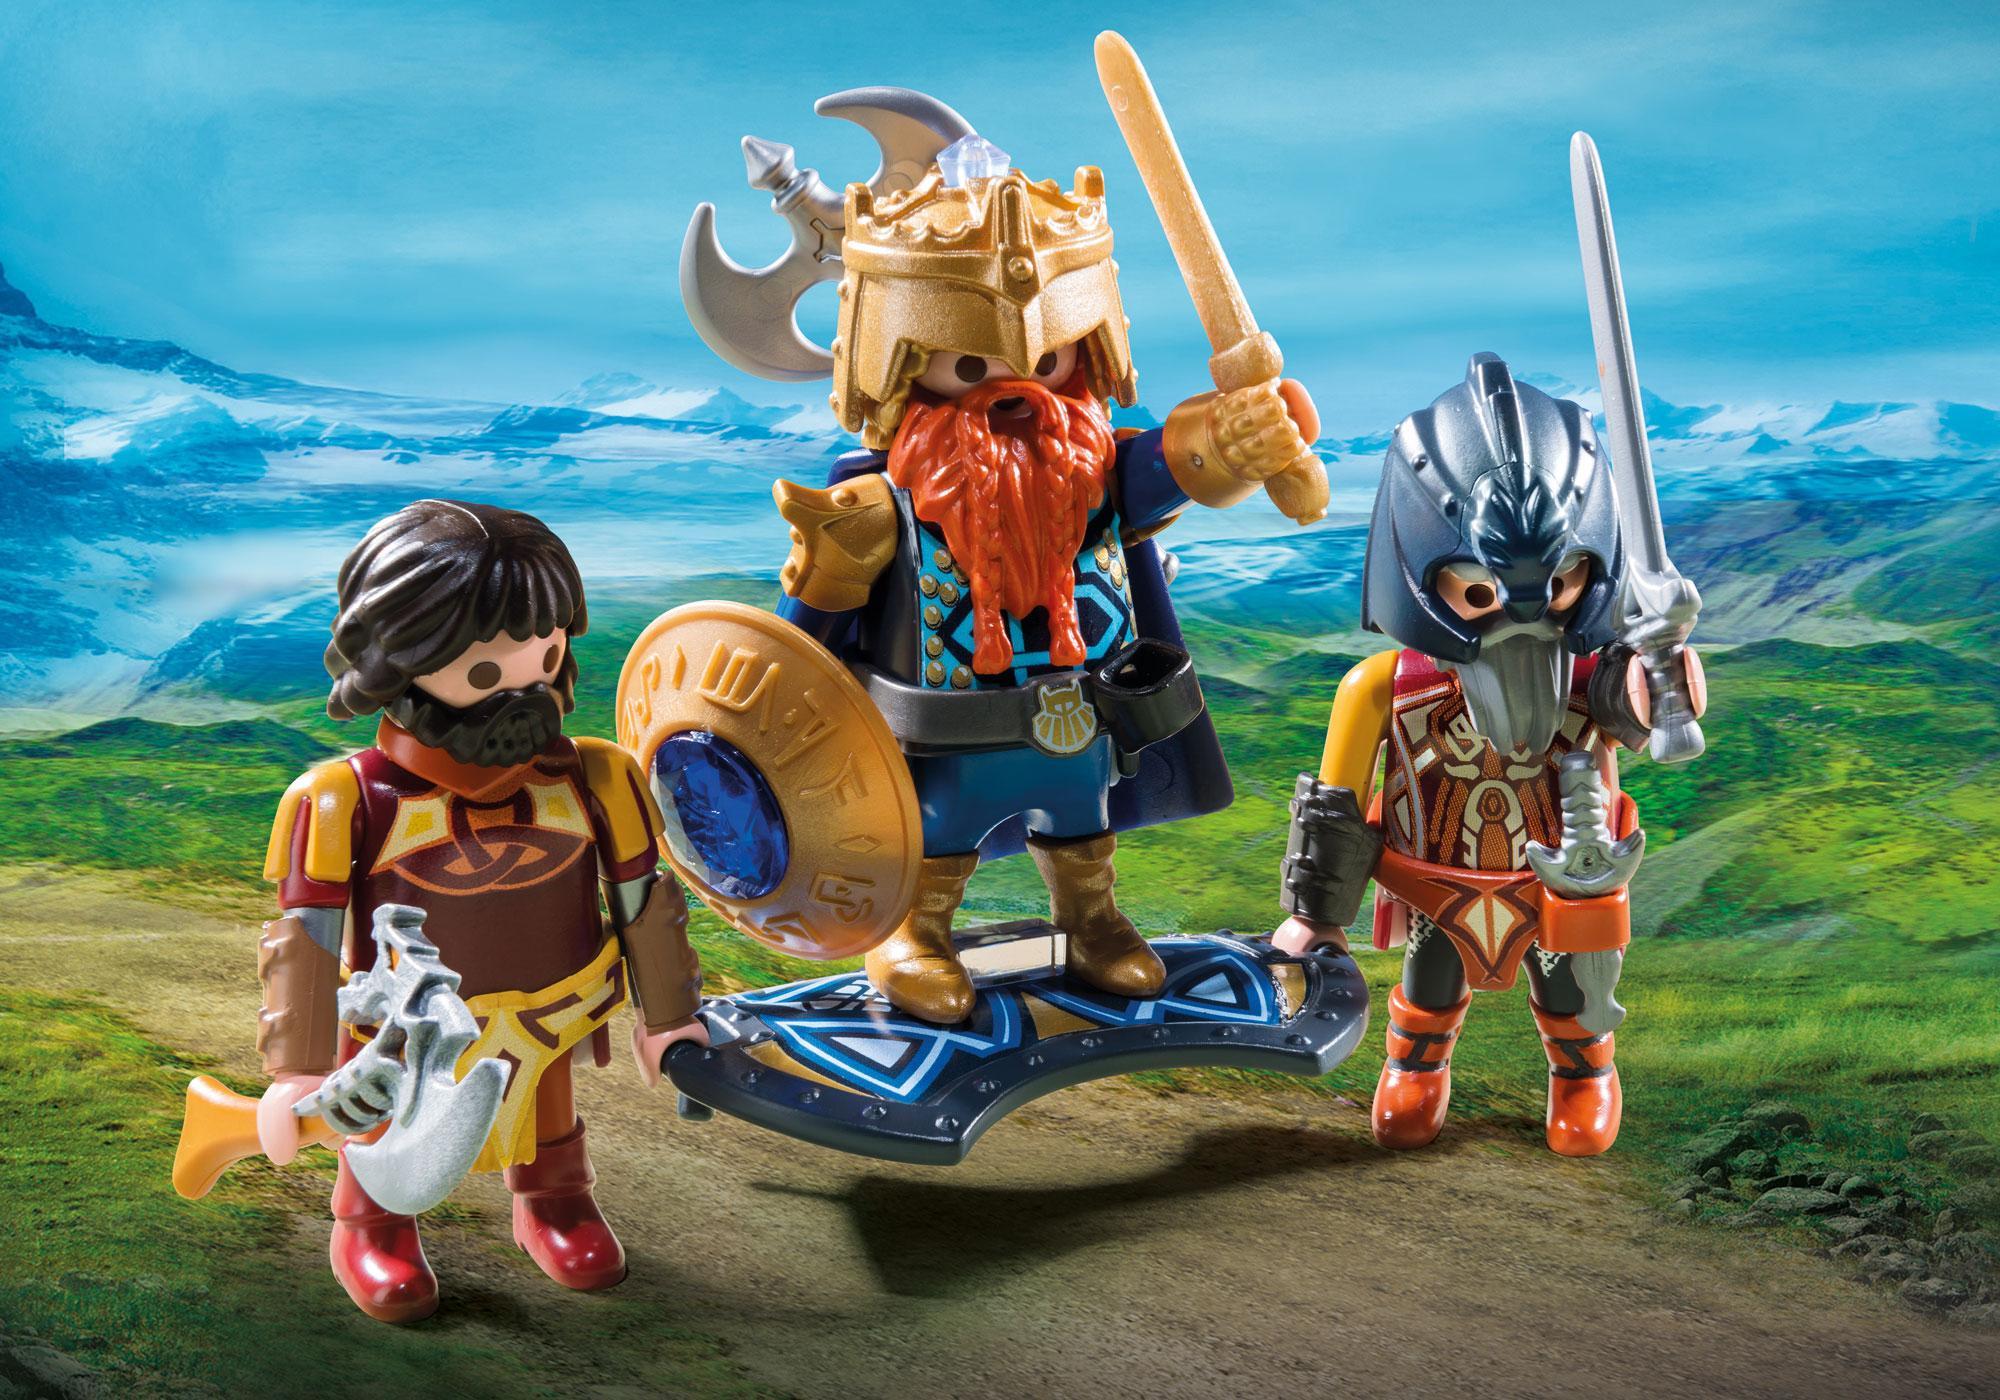 http://media.playmobil.com/i/playmobil/9344_product_extra1/Dwarf King with Guards